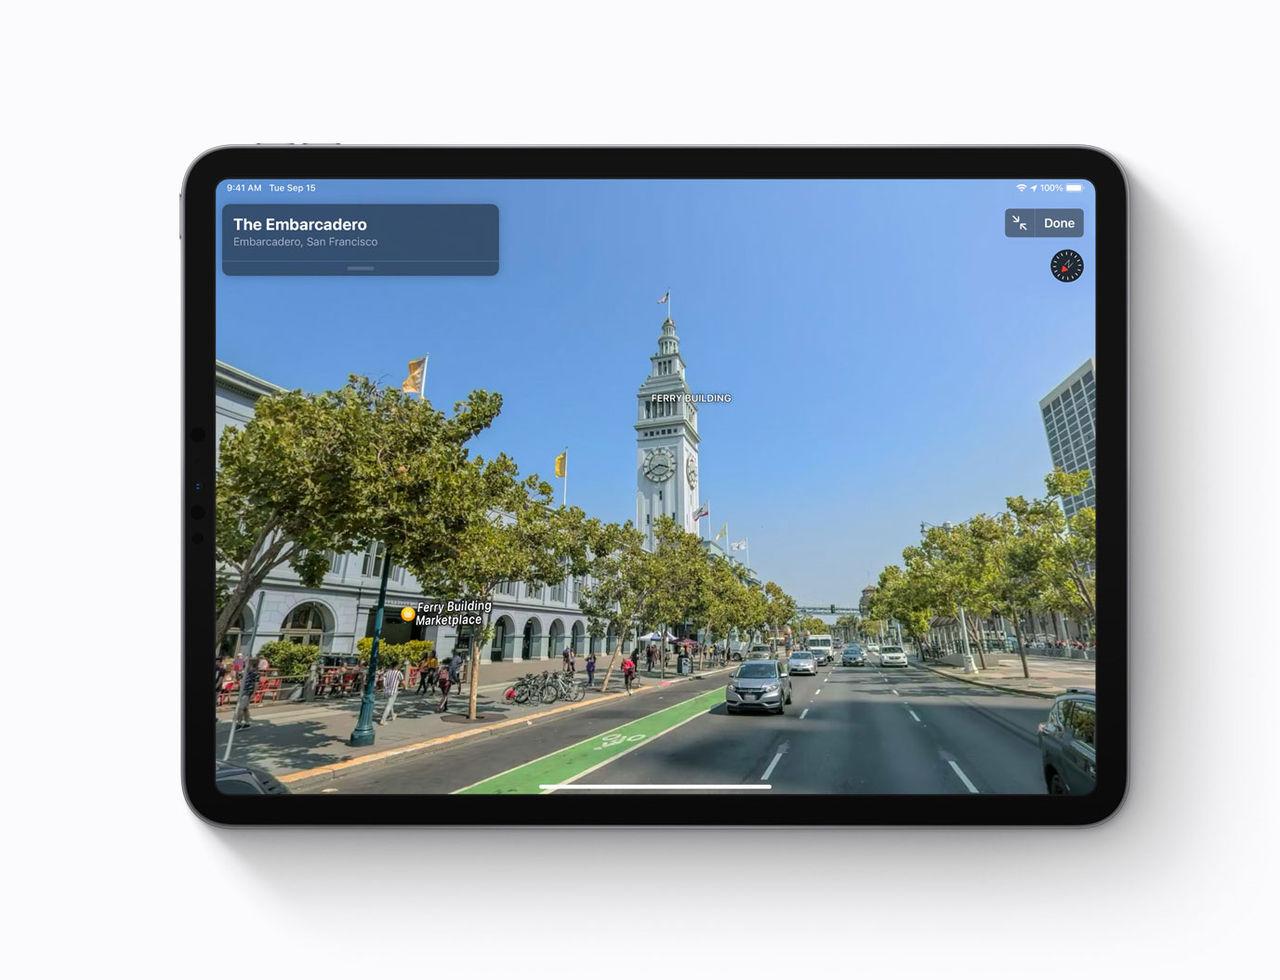 Snart kommer Apple Maps bli bättre i Sverige